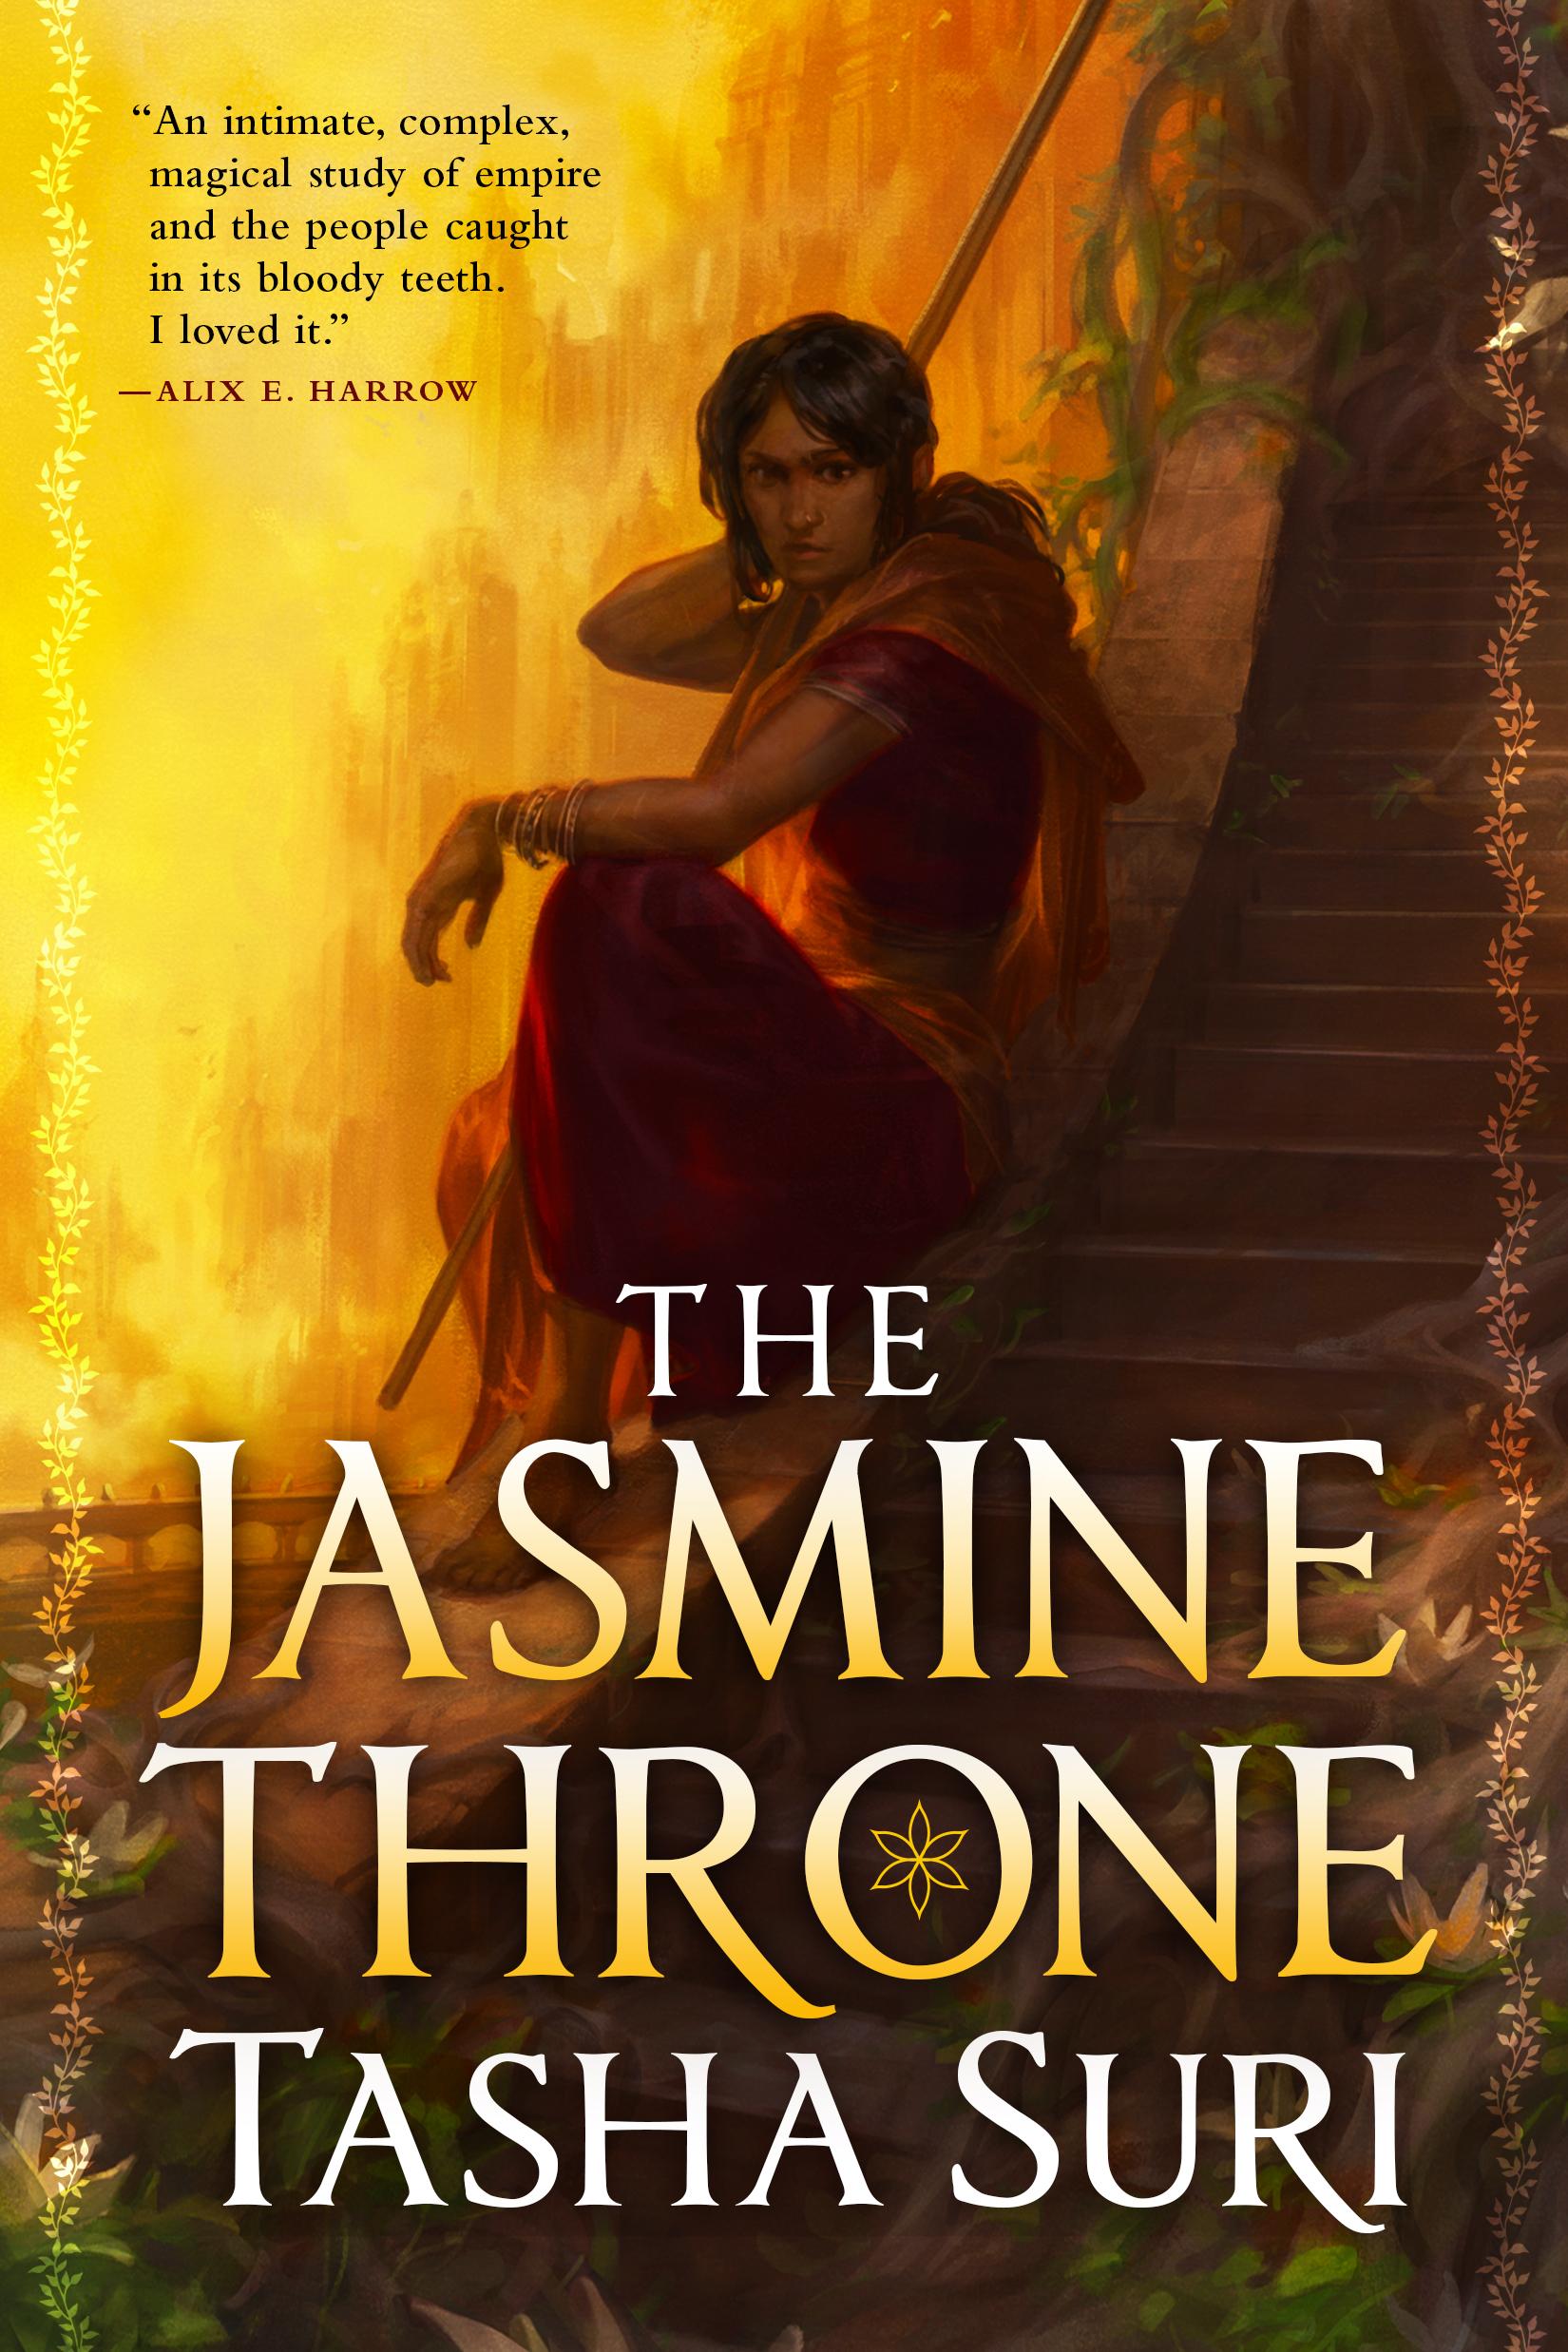 ICYMI: THE JASMINE THRONE by Tasha Suri